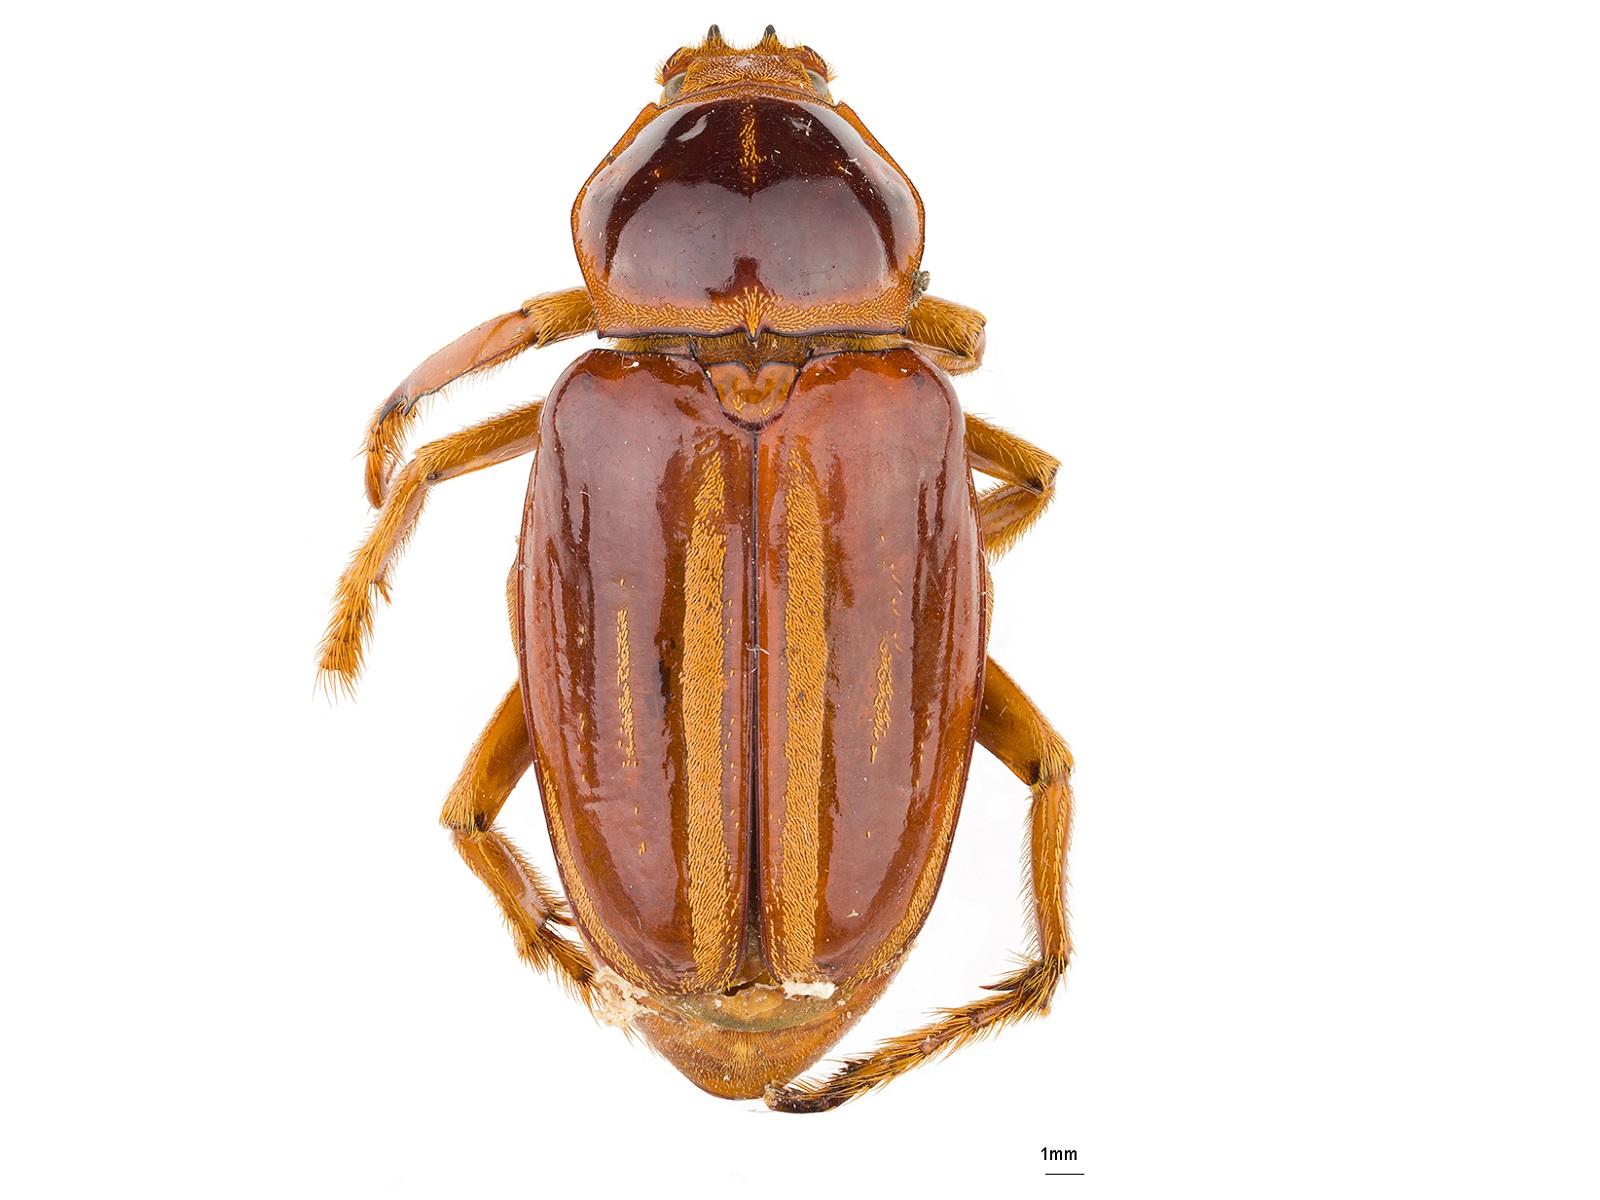 Ancistrosoma rufipes (Latreille, 1833)